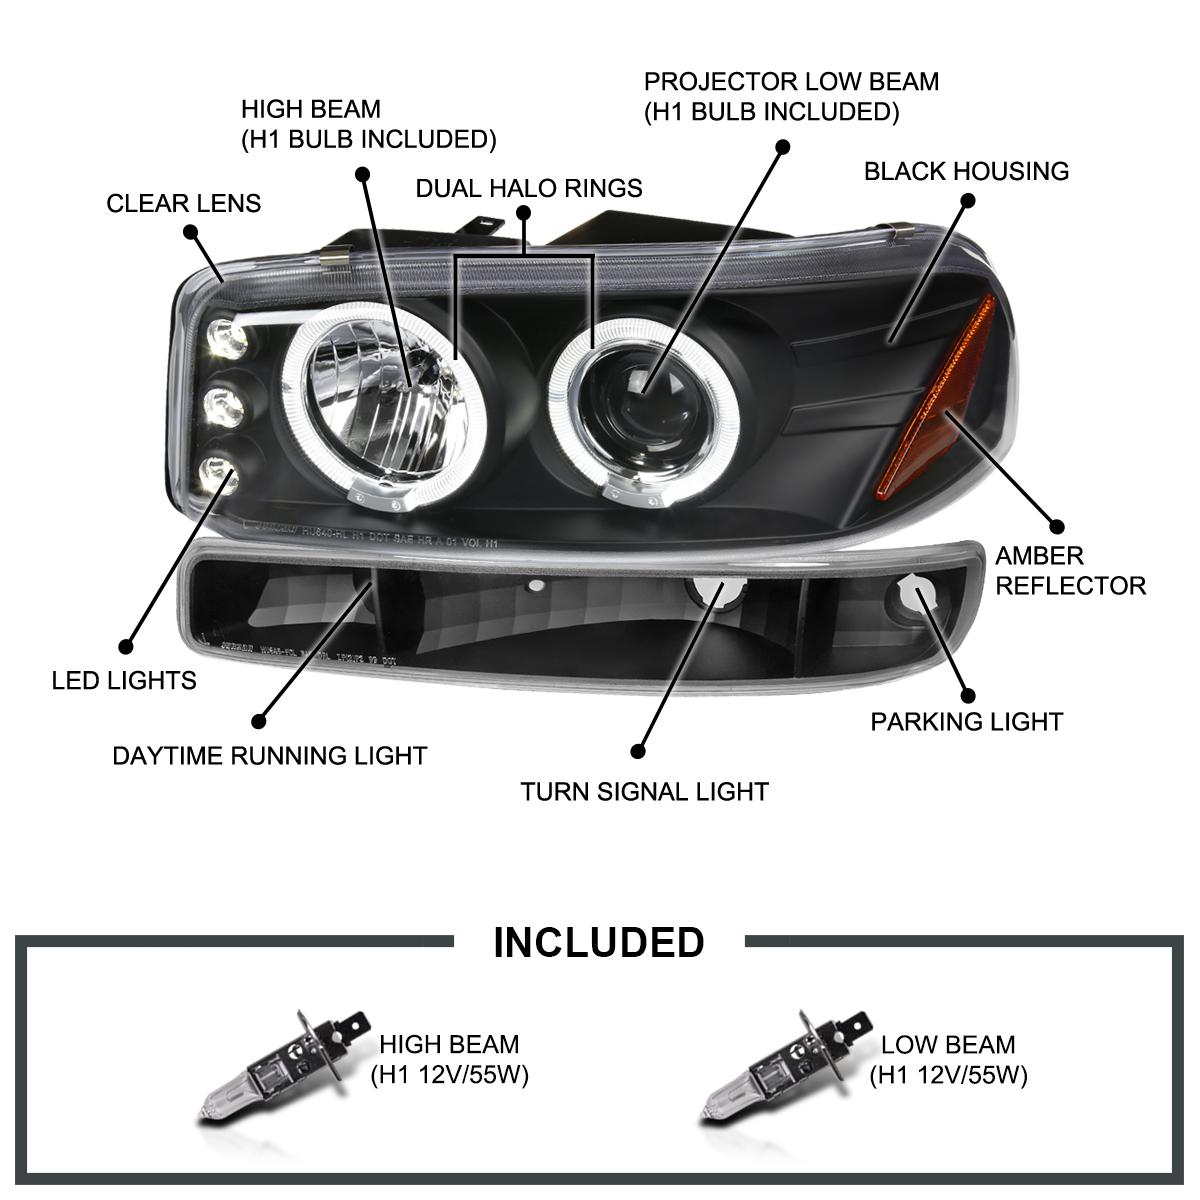 Yukon XL Pair Euro Clear Black Halo Headlights for 2000-2006 GMC Sierra Yukon